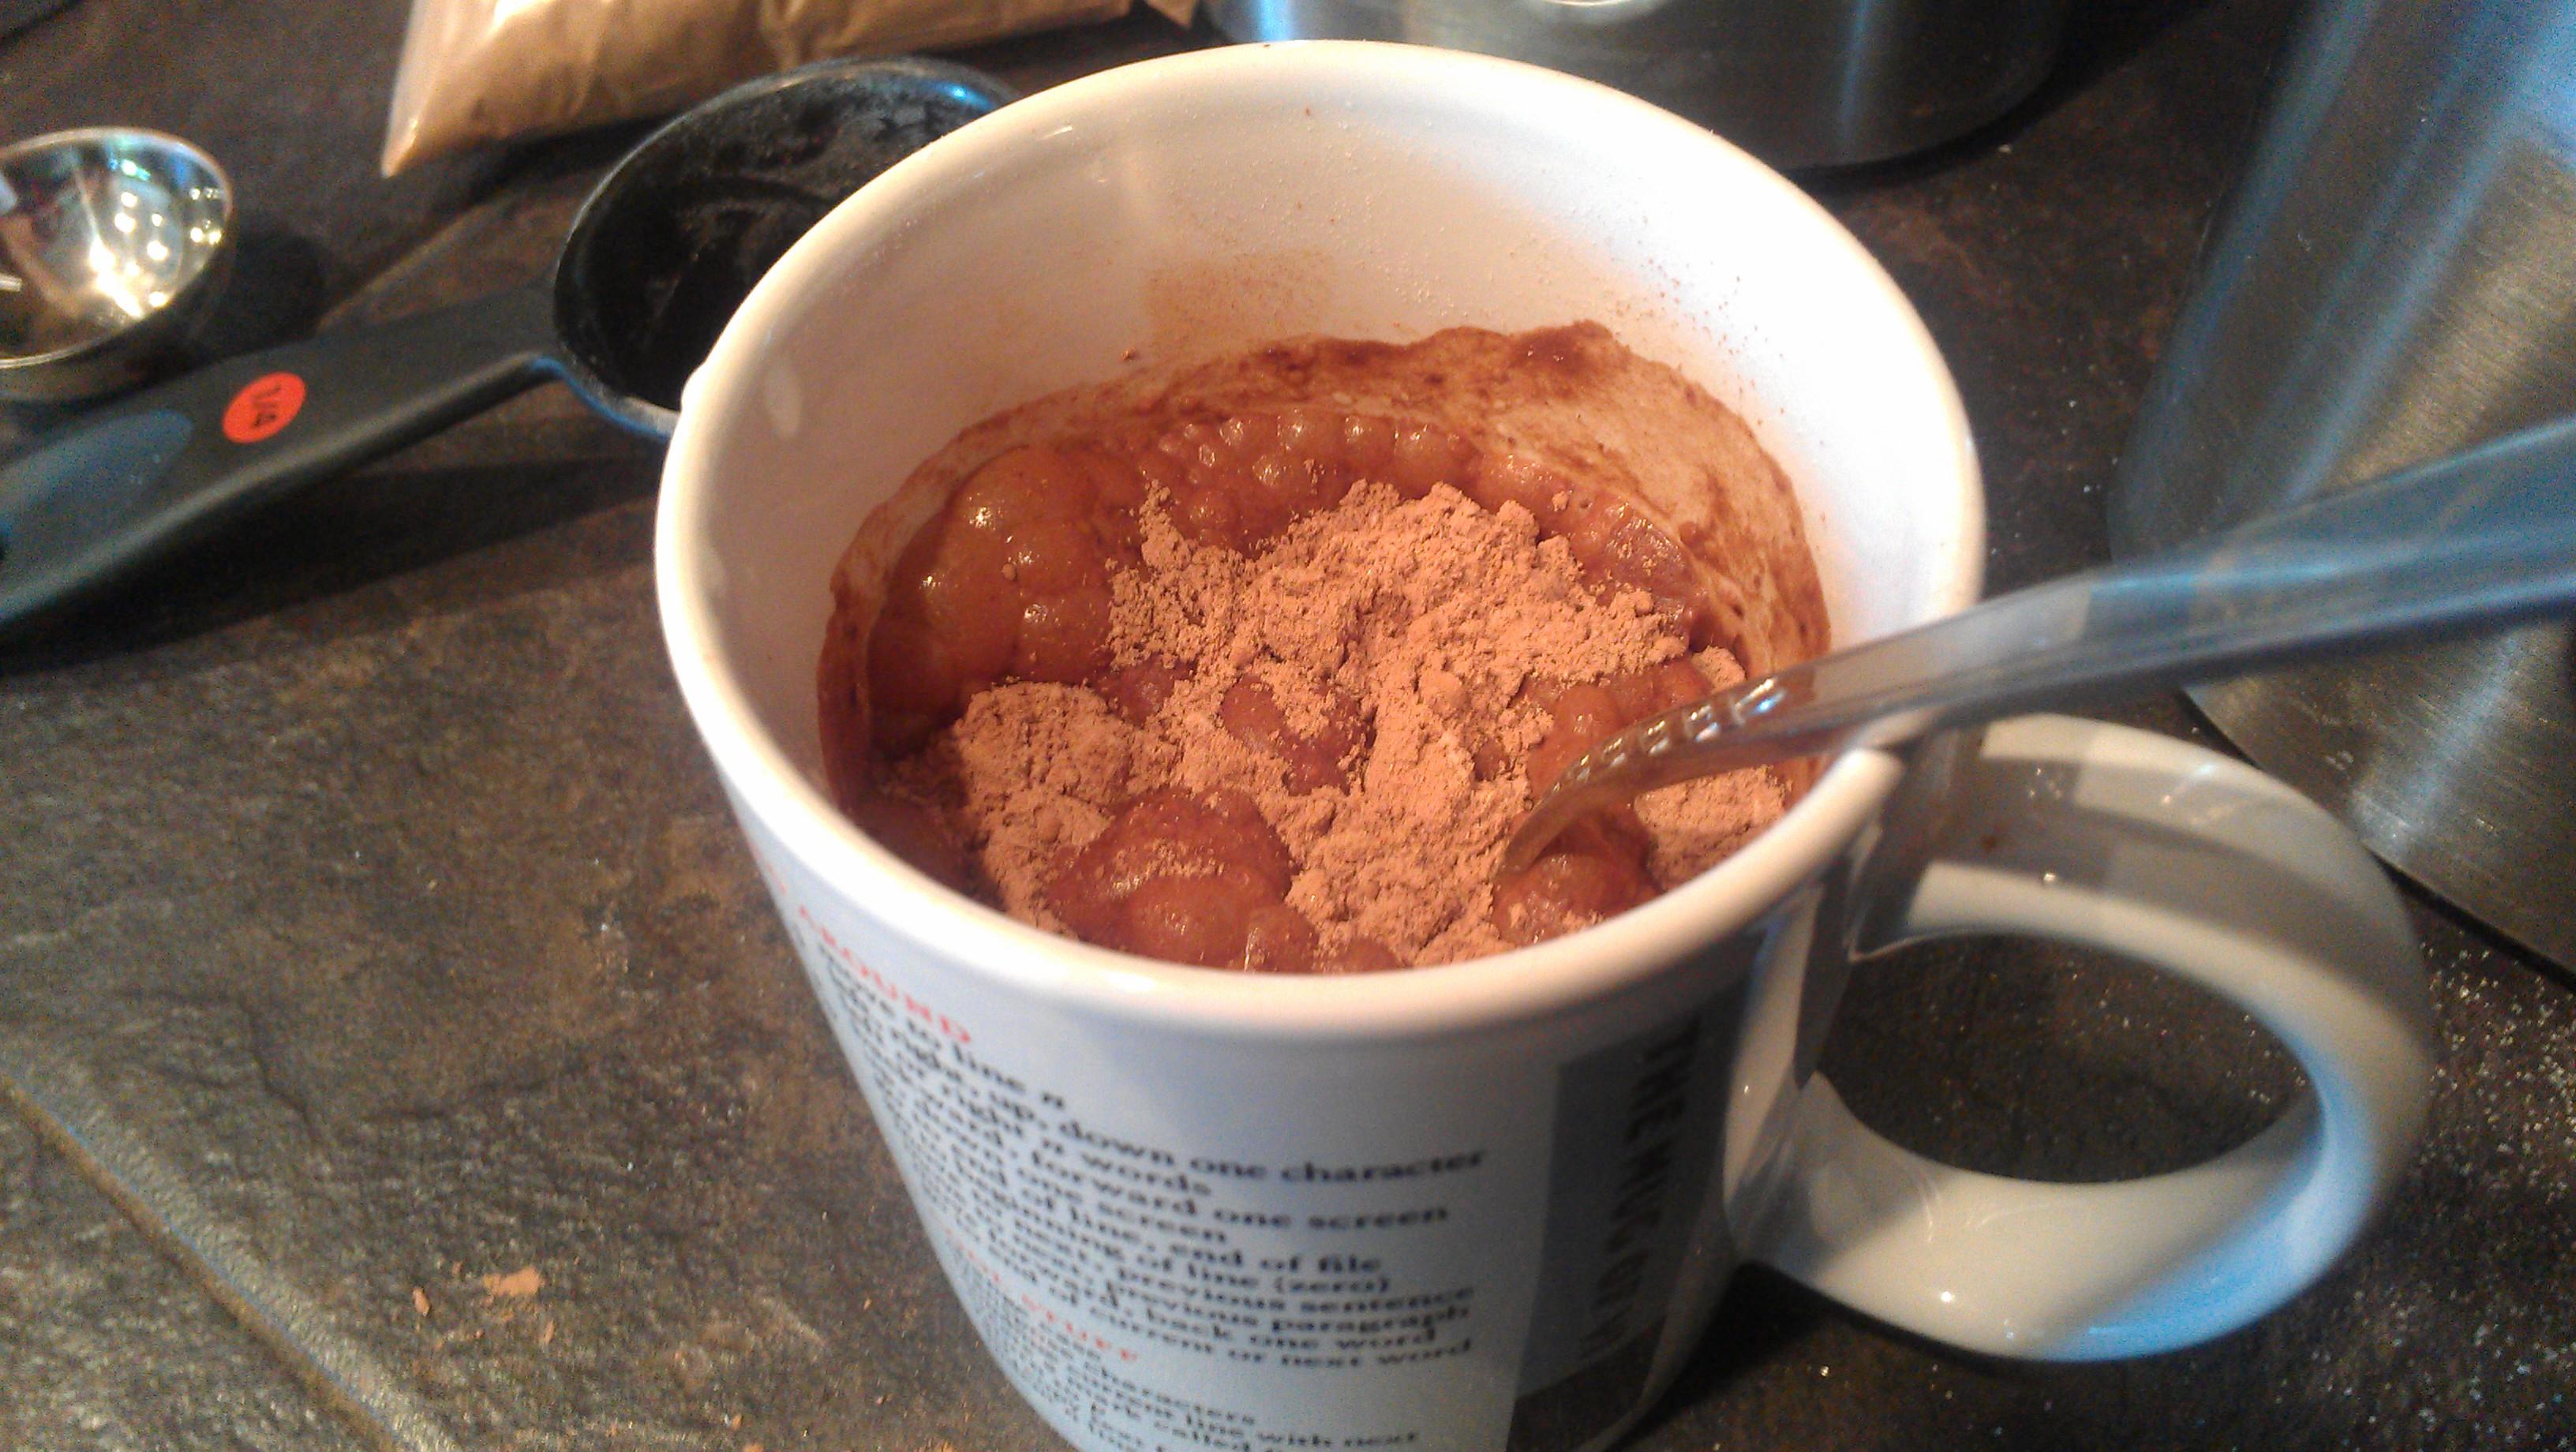 Bubbling uncooked mug o' brownie